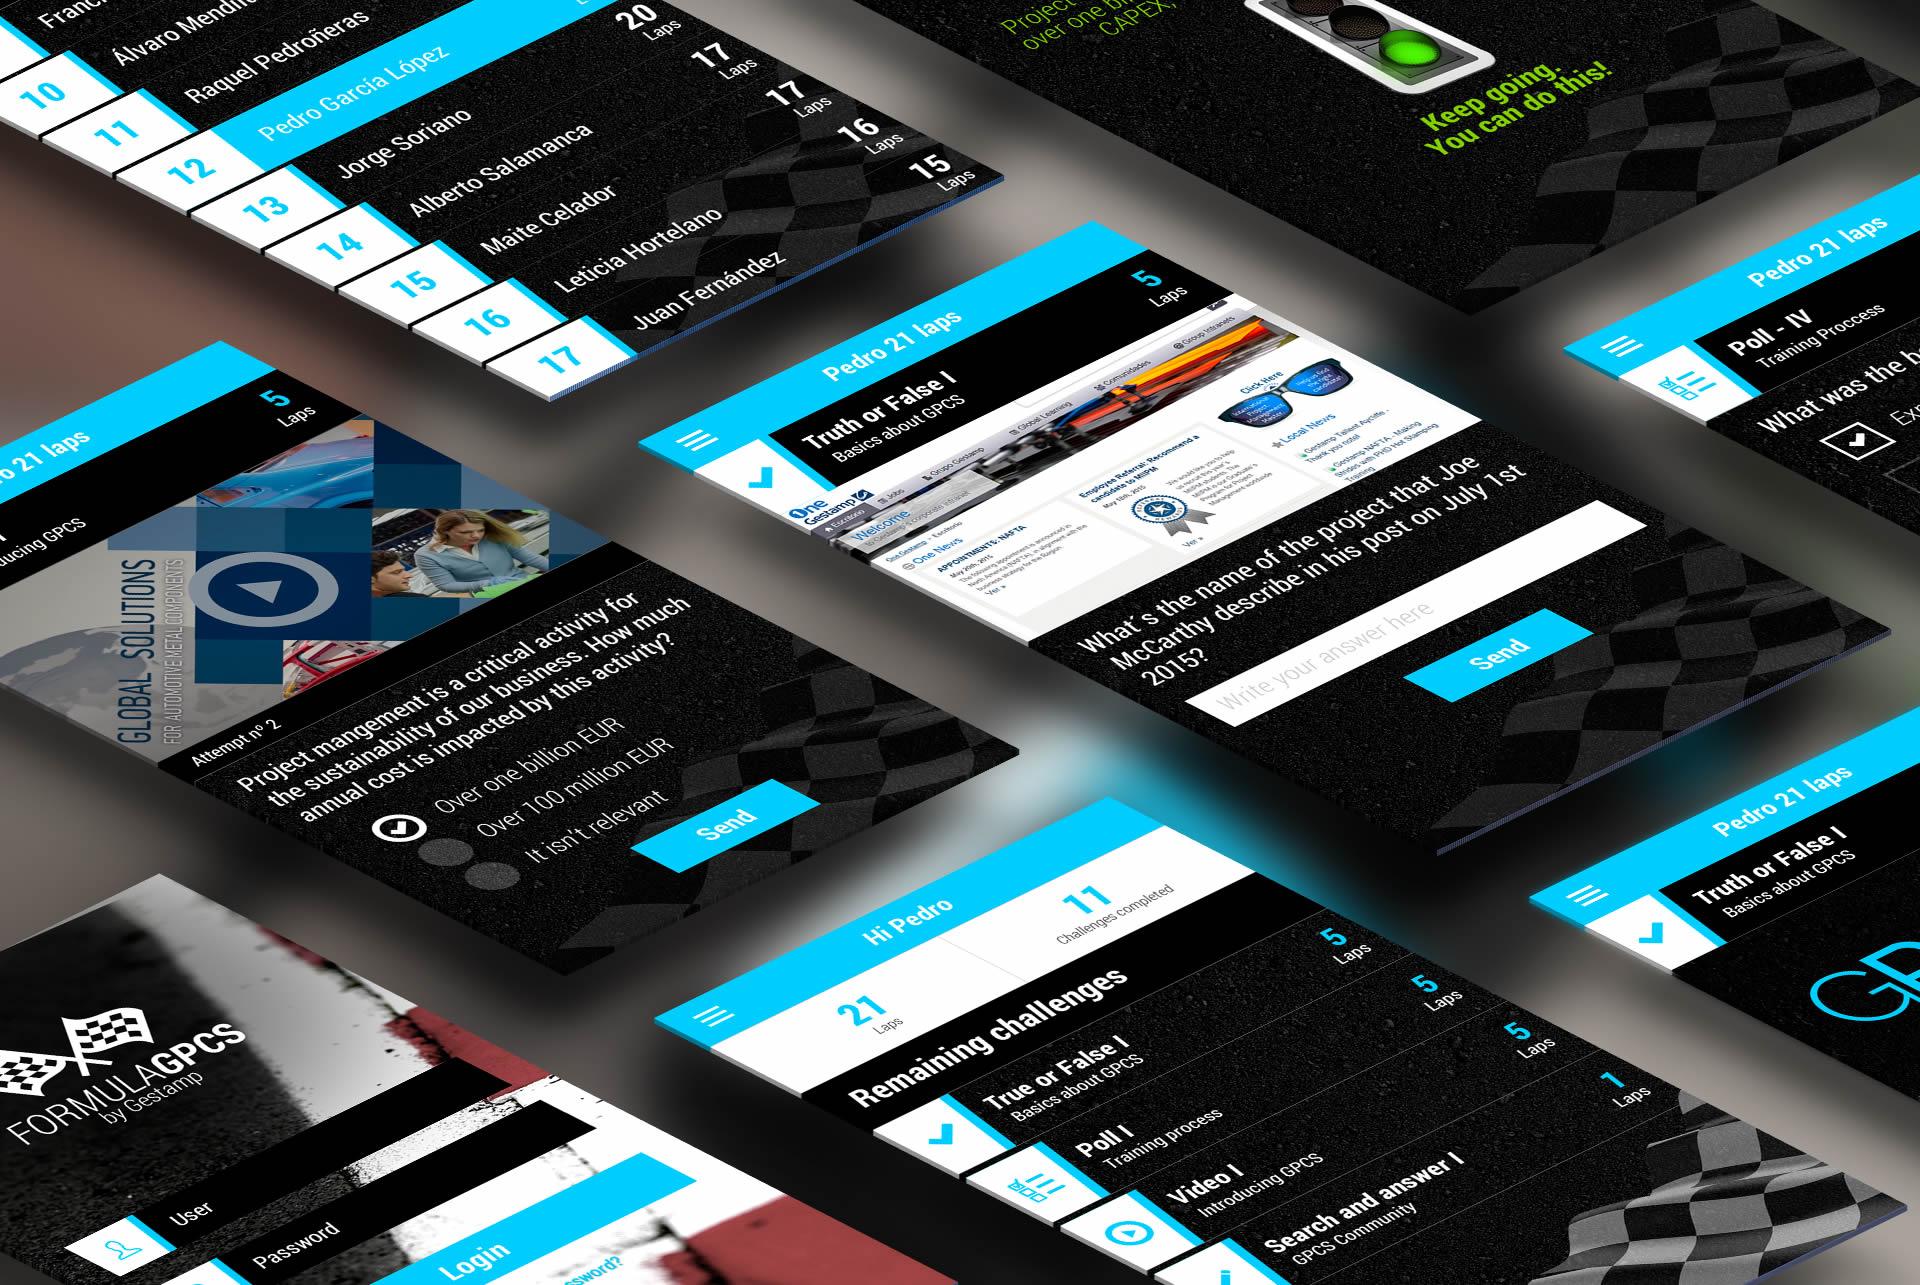 Gestamp - GPCS - App Mobile showcase